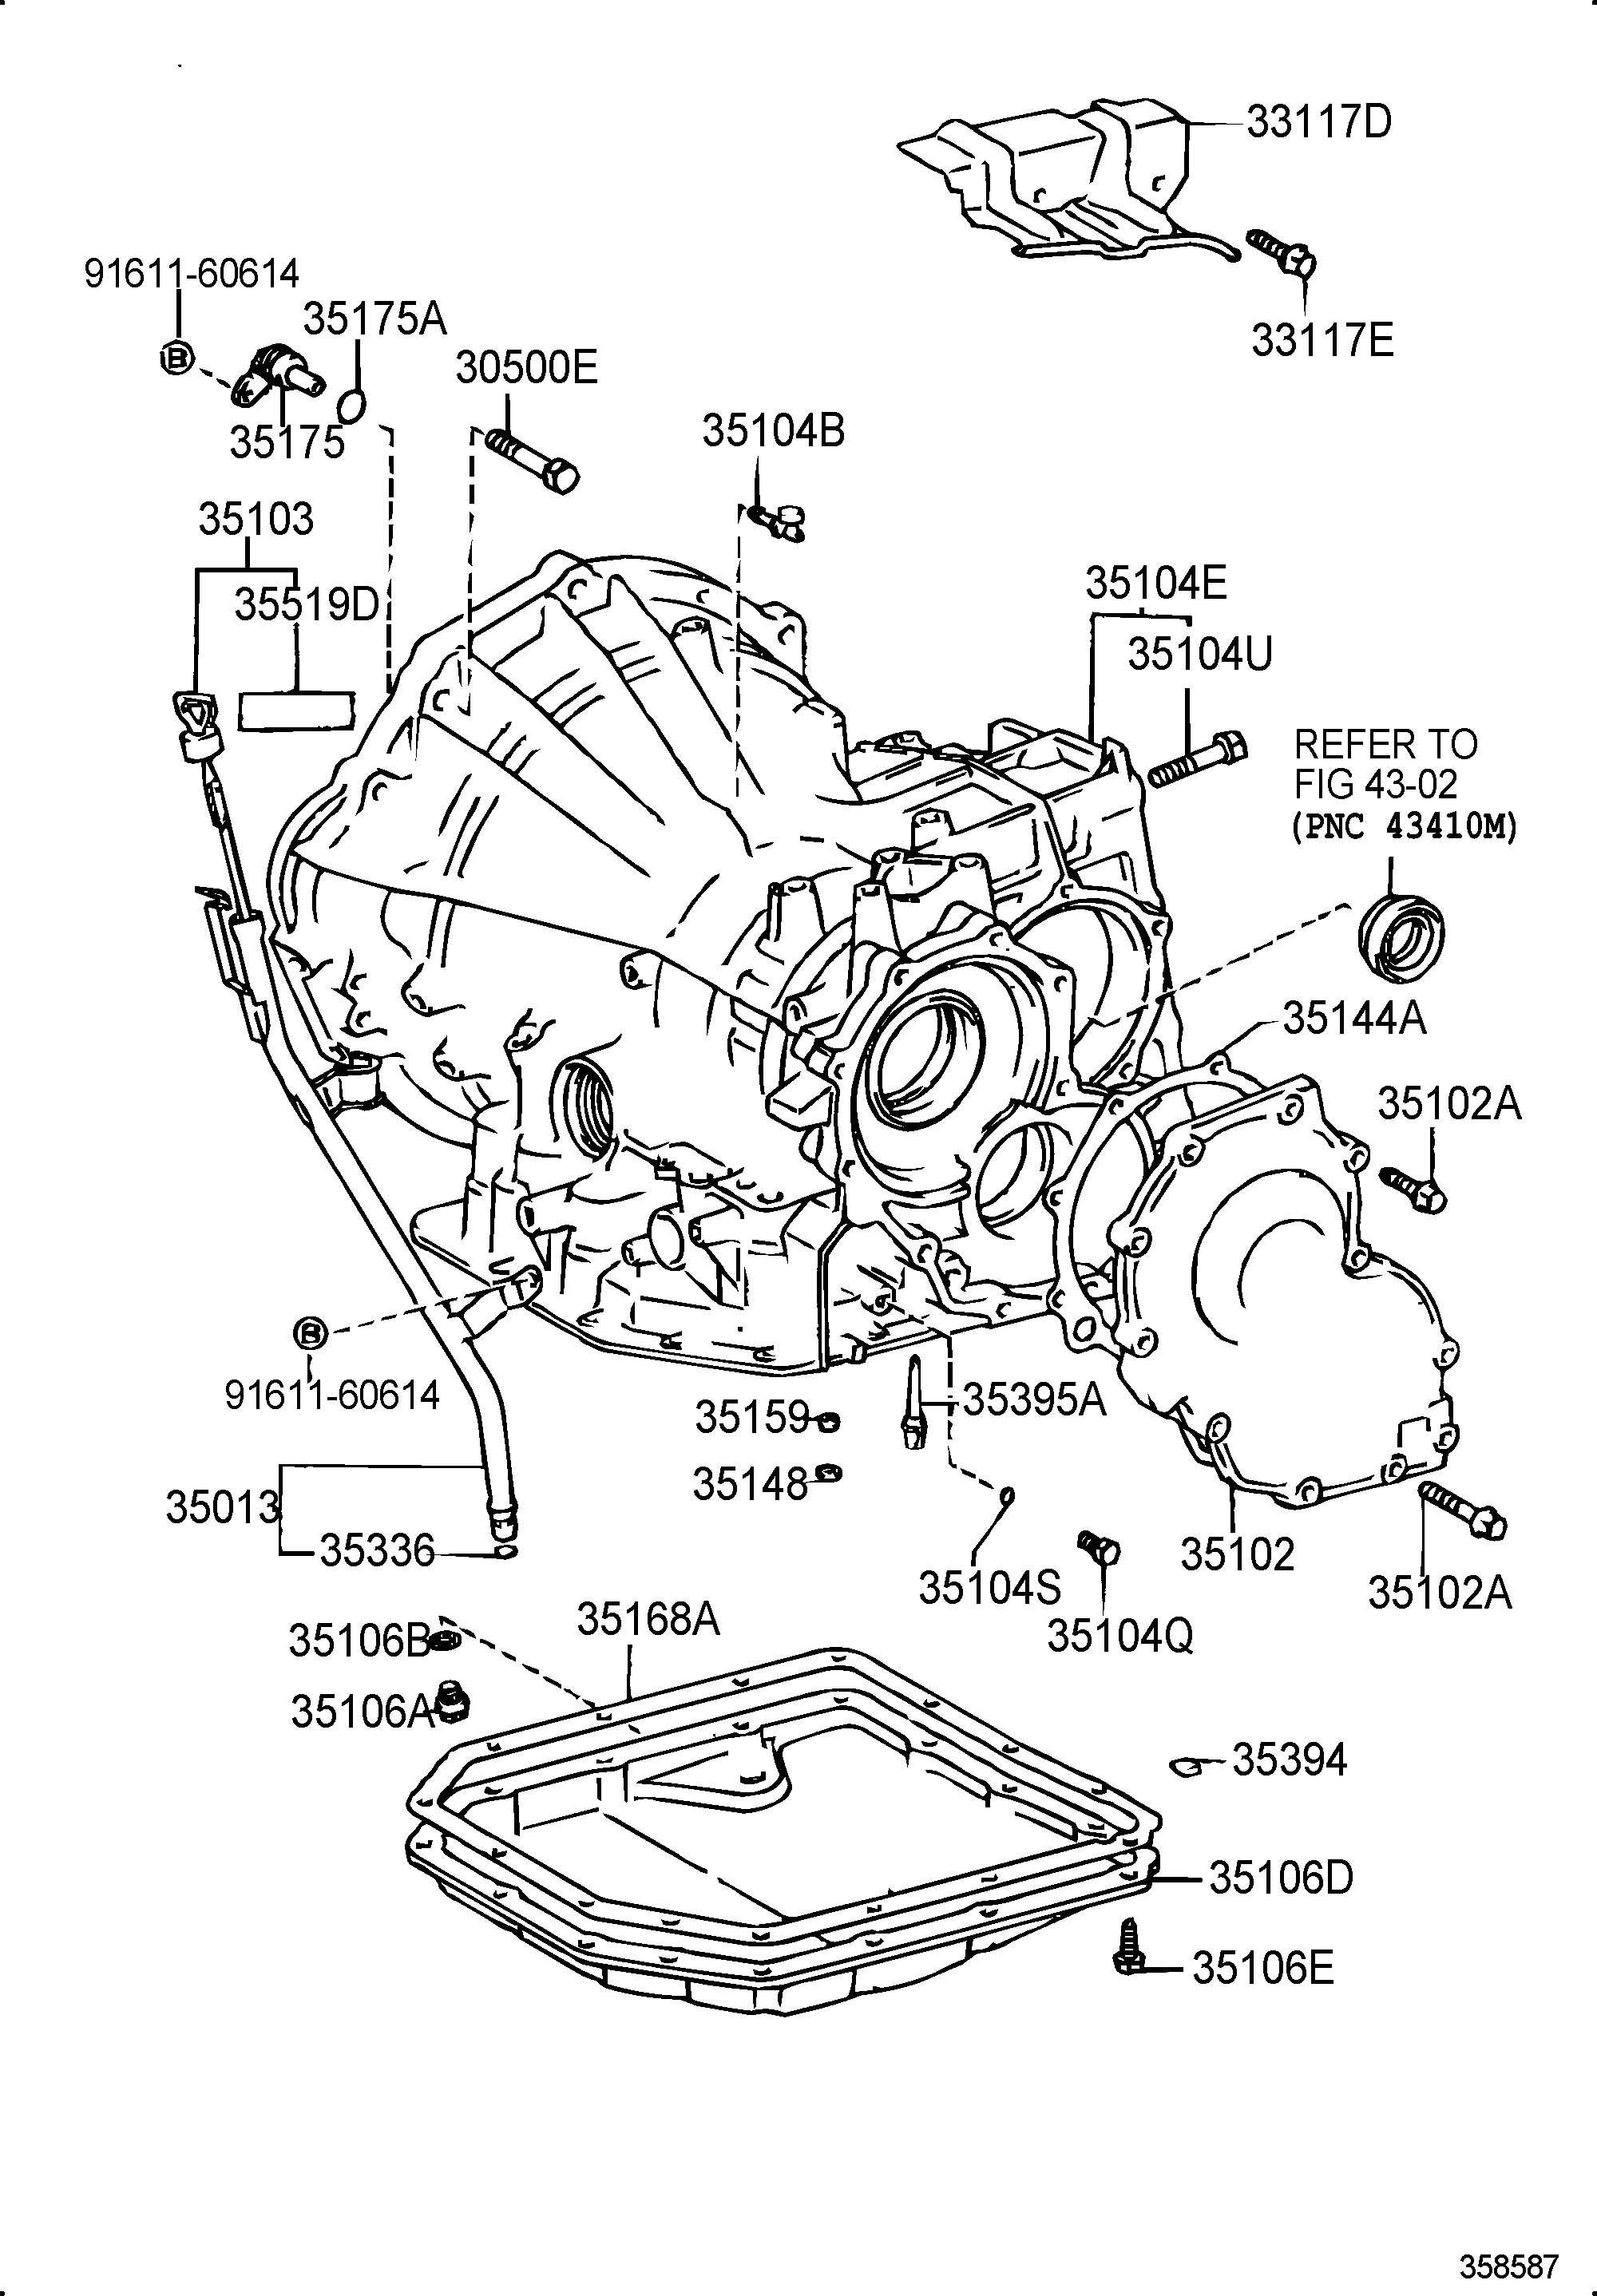 1993 Toyota Corolla 4-DOOR SEDAN, STD 1600CC 16-VALVE DOHC